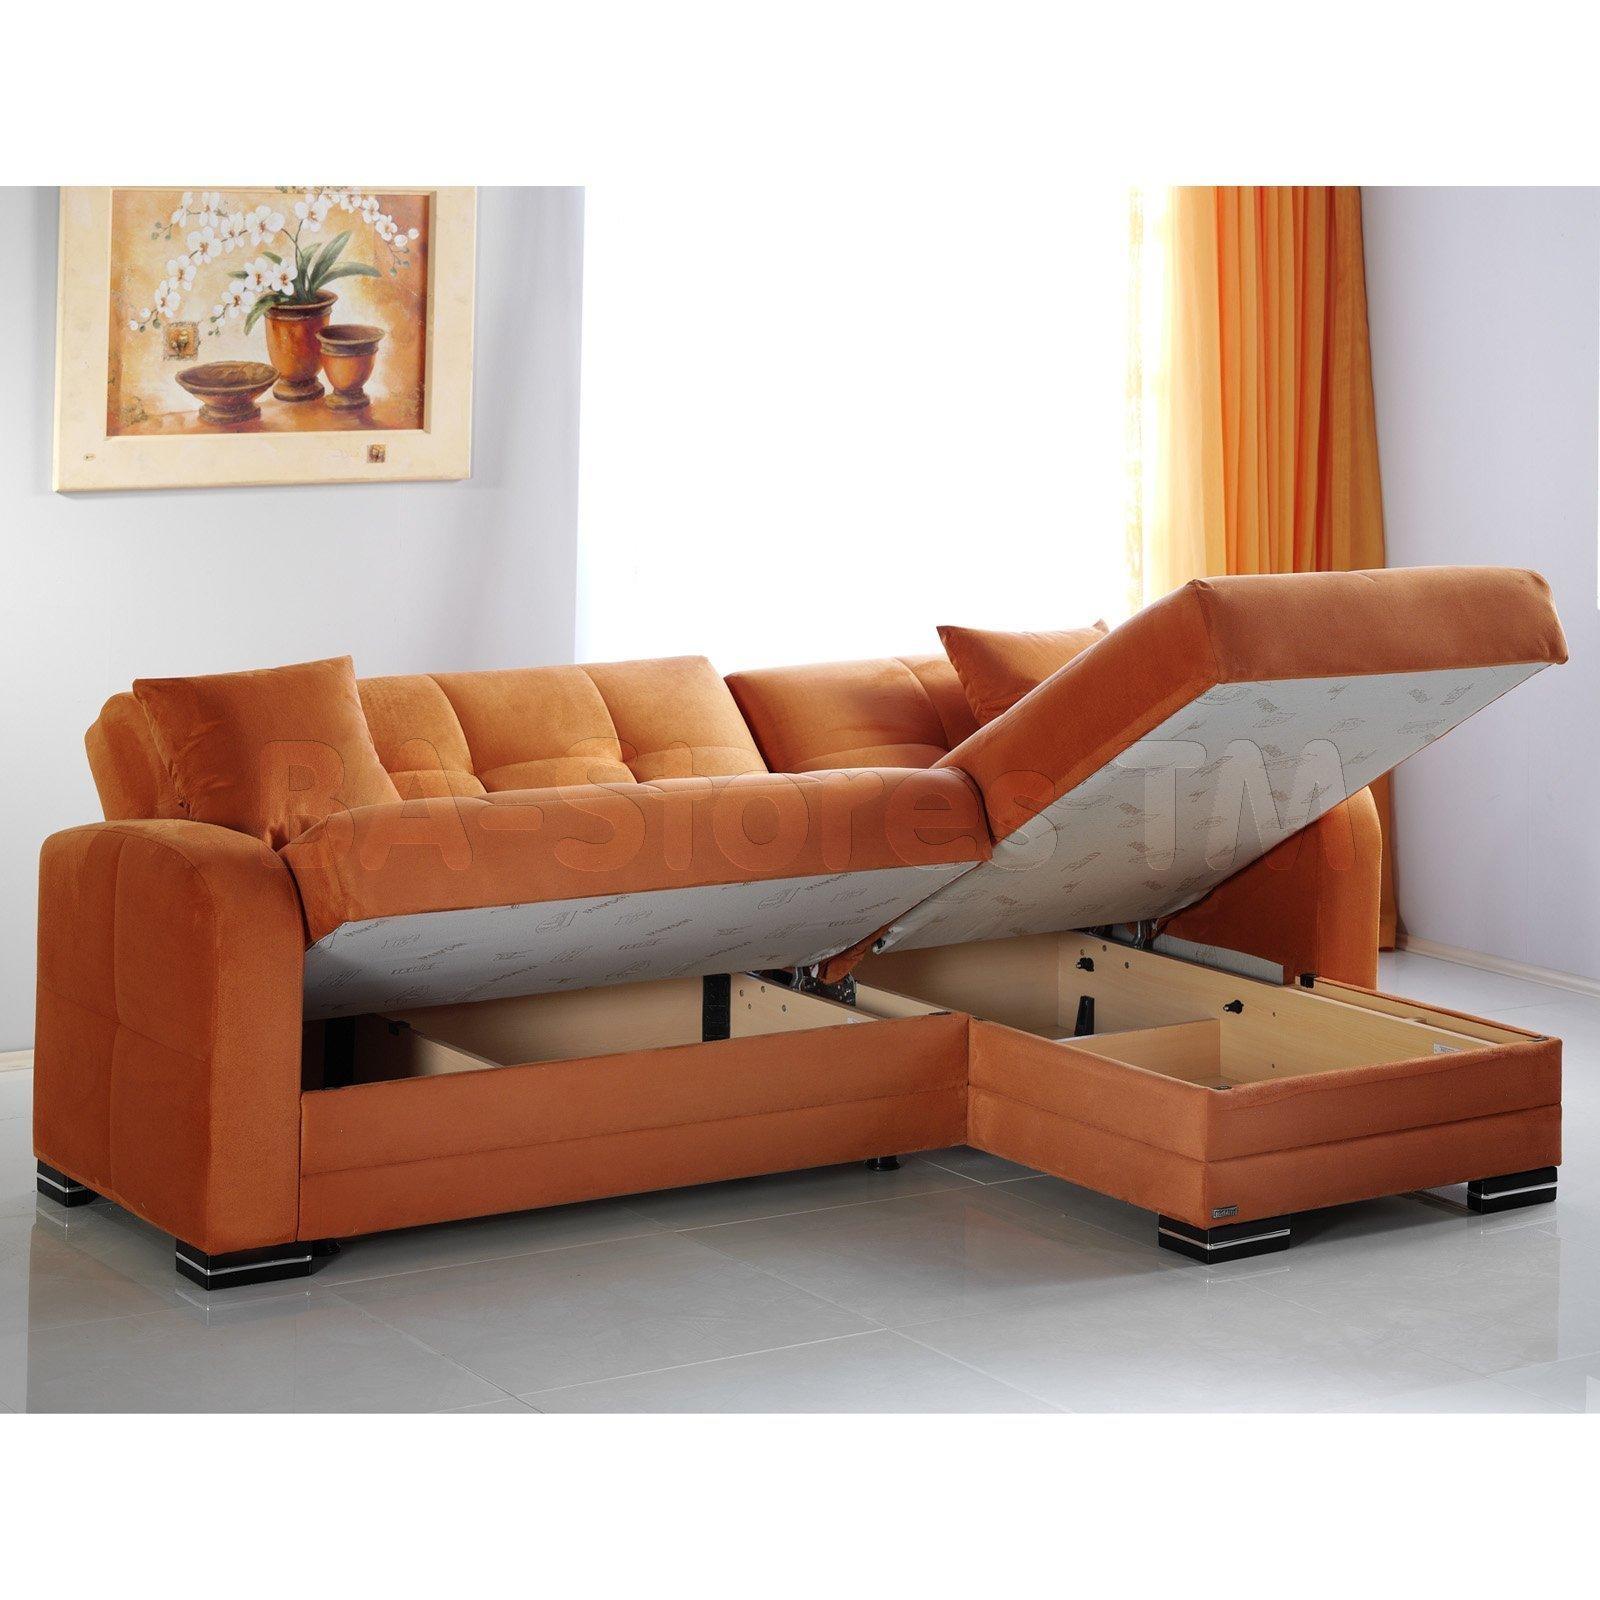 Burnt Orange Leather Sofa With Design Ideas 16541 | Kengire Within Burnt Orange Leather Sofas (Image 3 of 20)